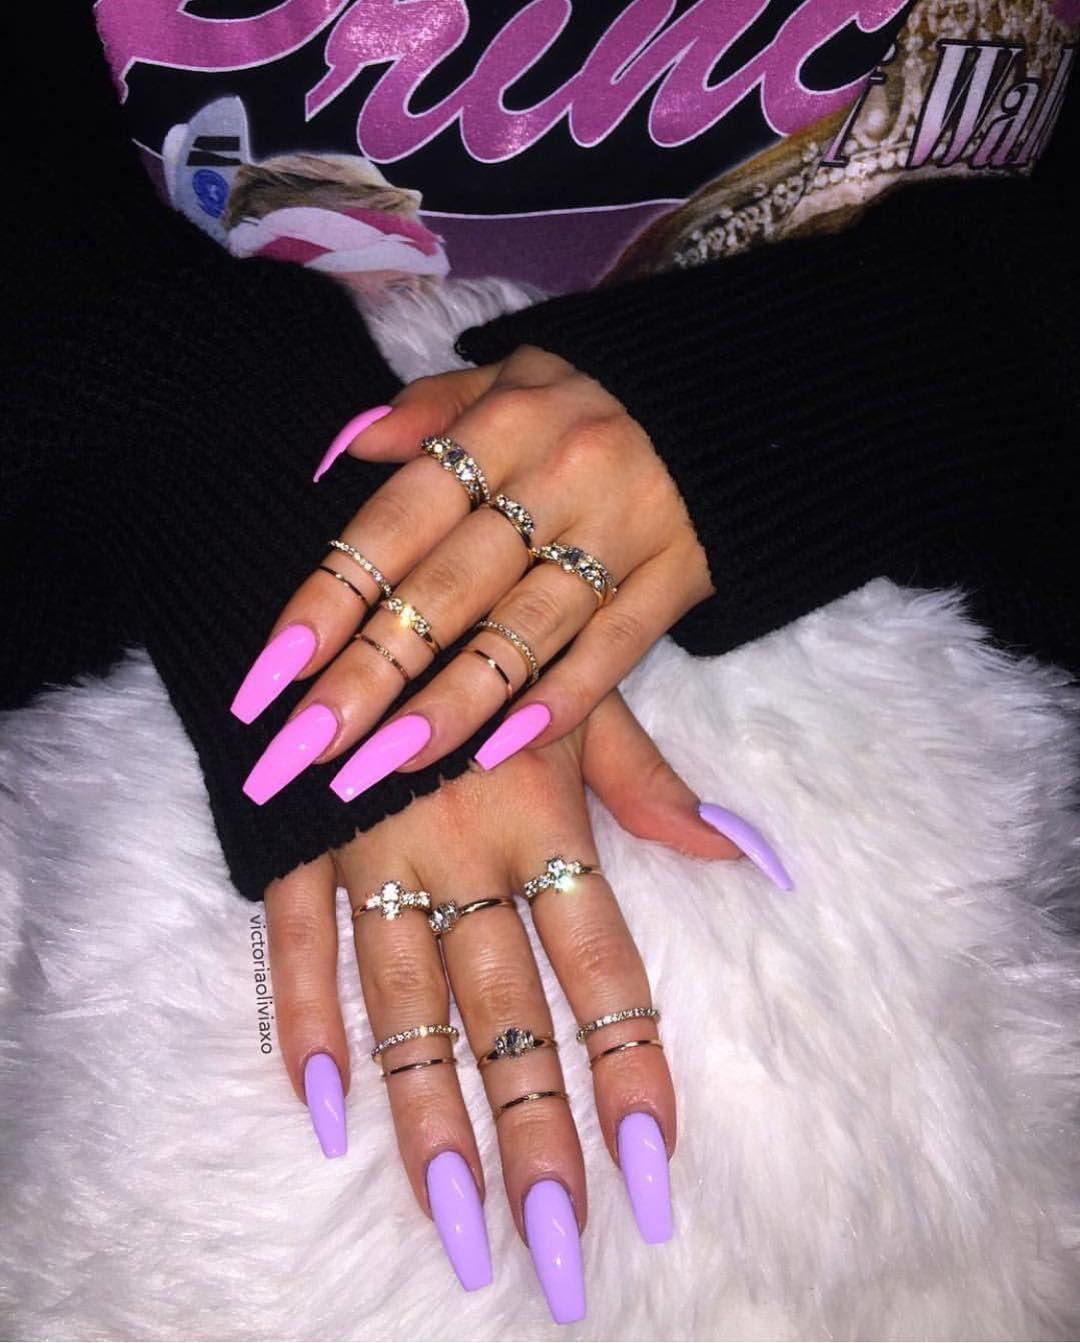 Riityeyayeѕt Aѕn02x Pretty Acrylic Nails Glitter Gel Nails Bright Summer Nails